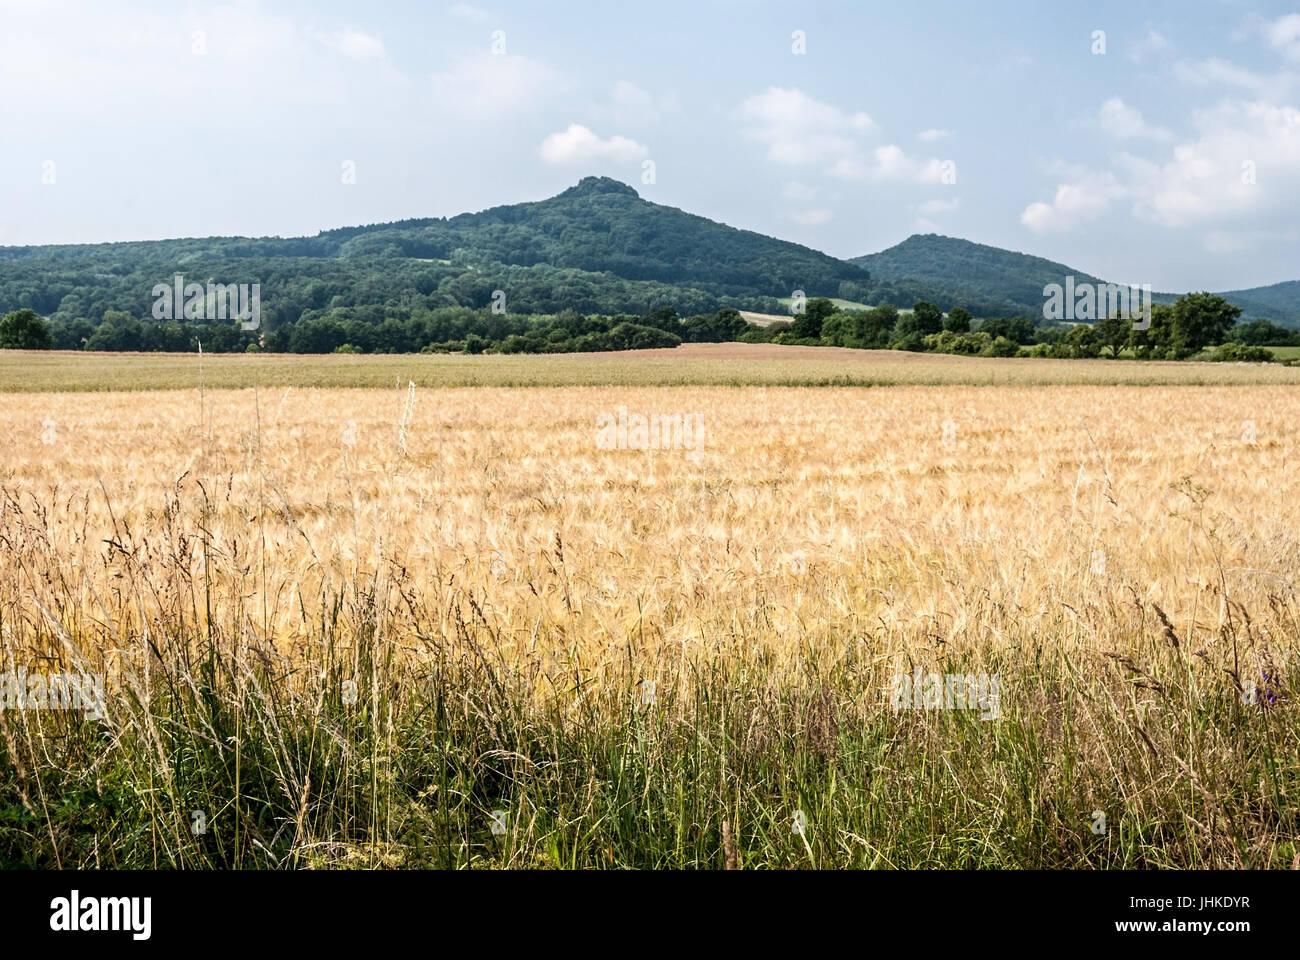 nice landscaoe of Ceske stredohori mountains near Lovosice city in Czech republic with corny field, Ostry and Lipska - Stock Image